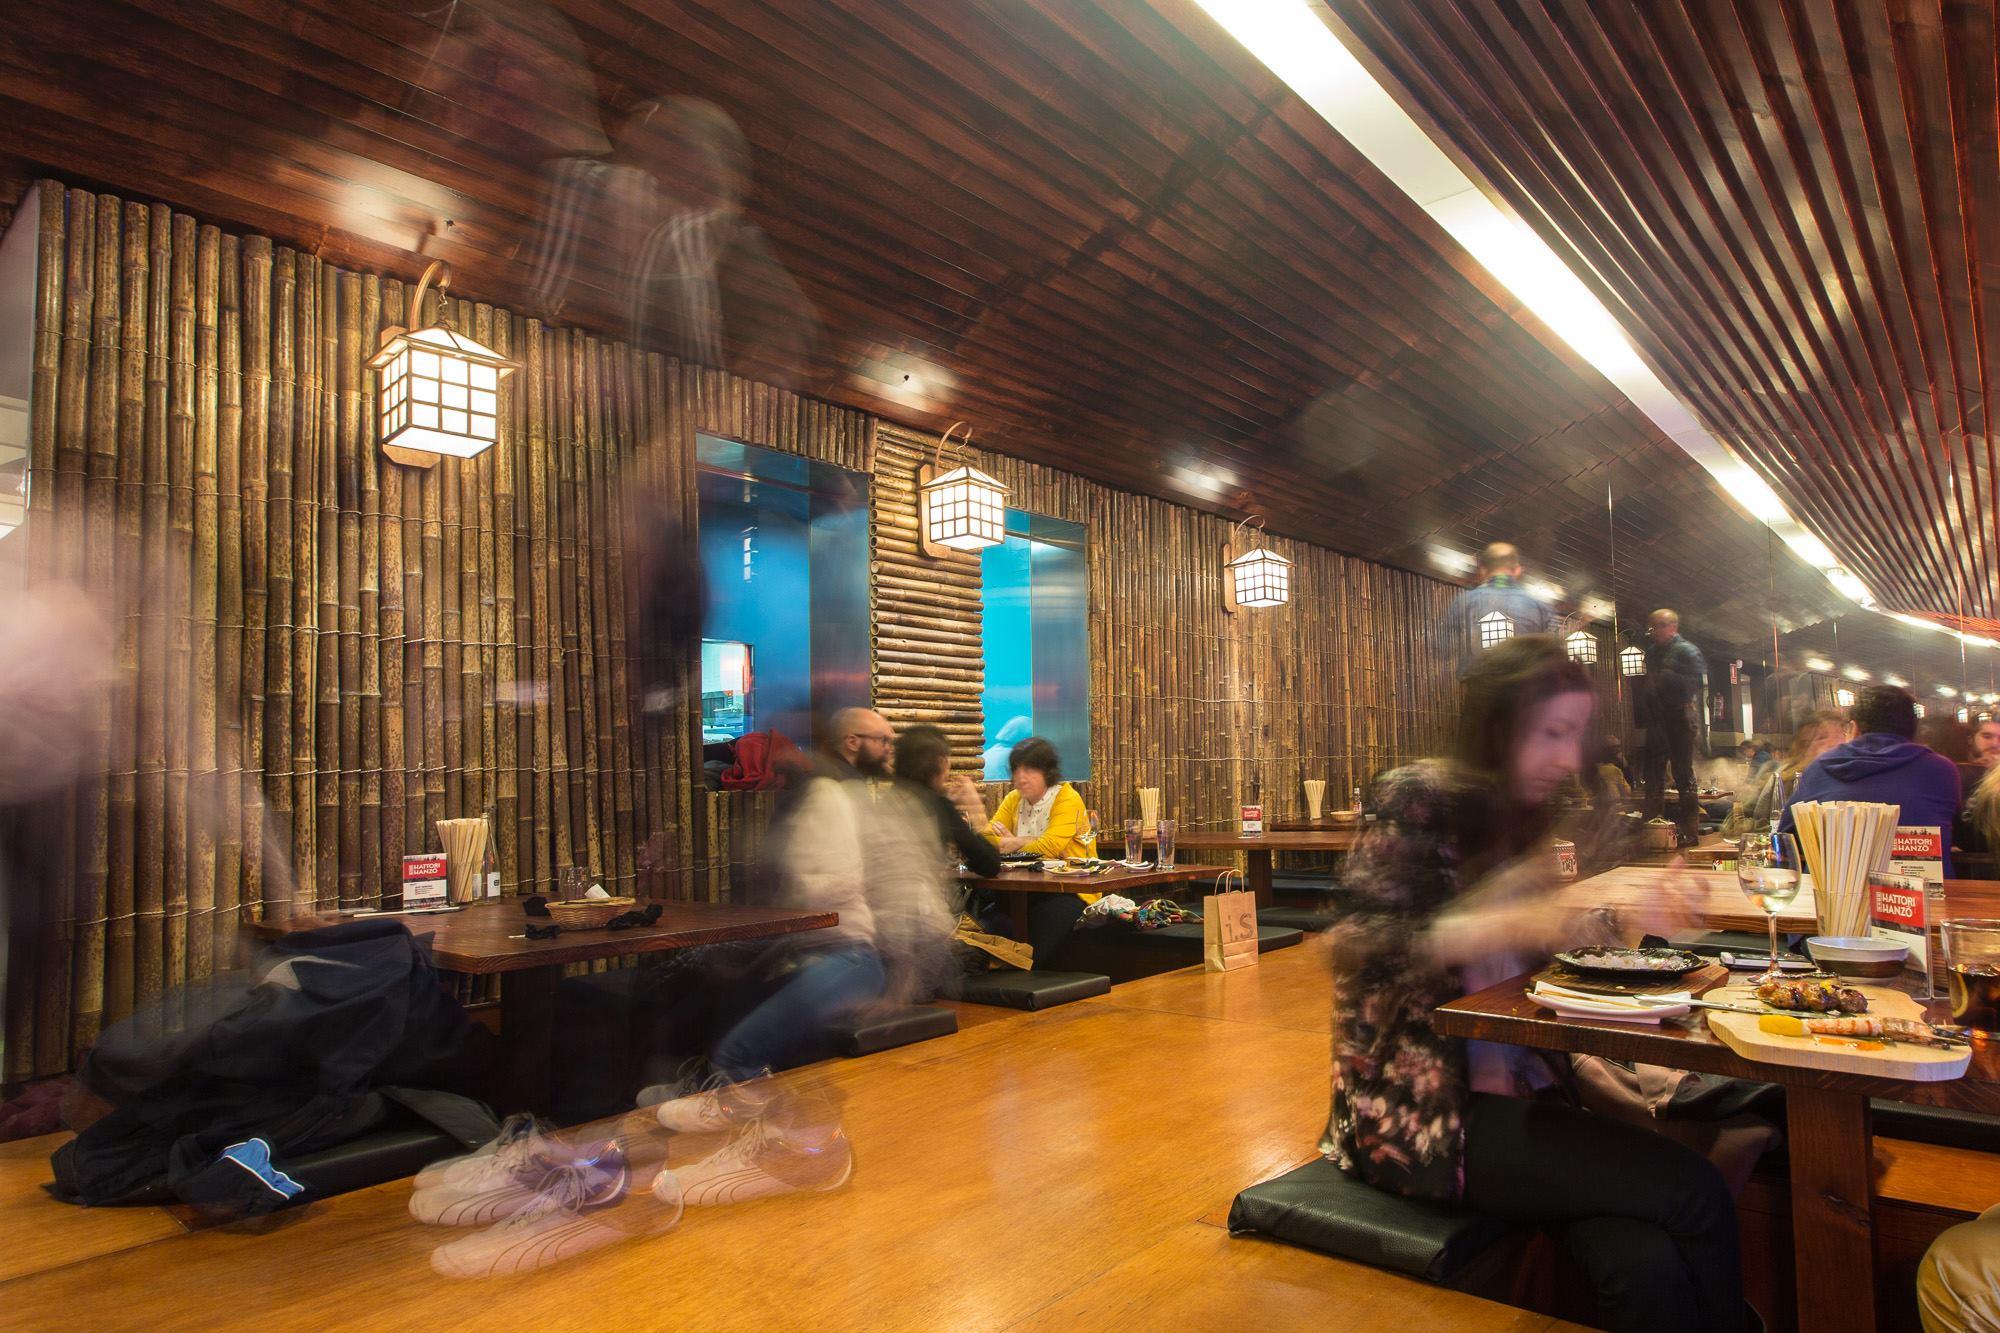 Aquí comer de rodillas tiene truco. Foto: Hattori Hanzo.